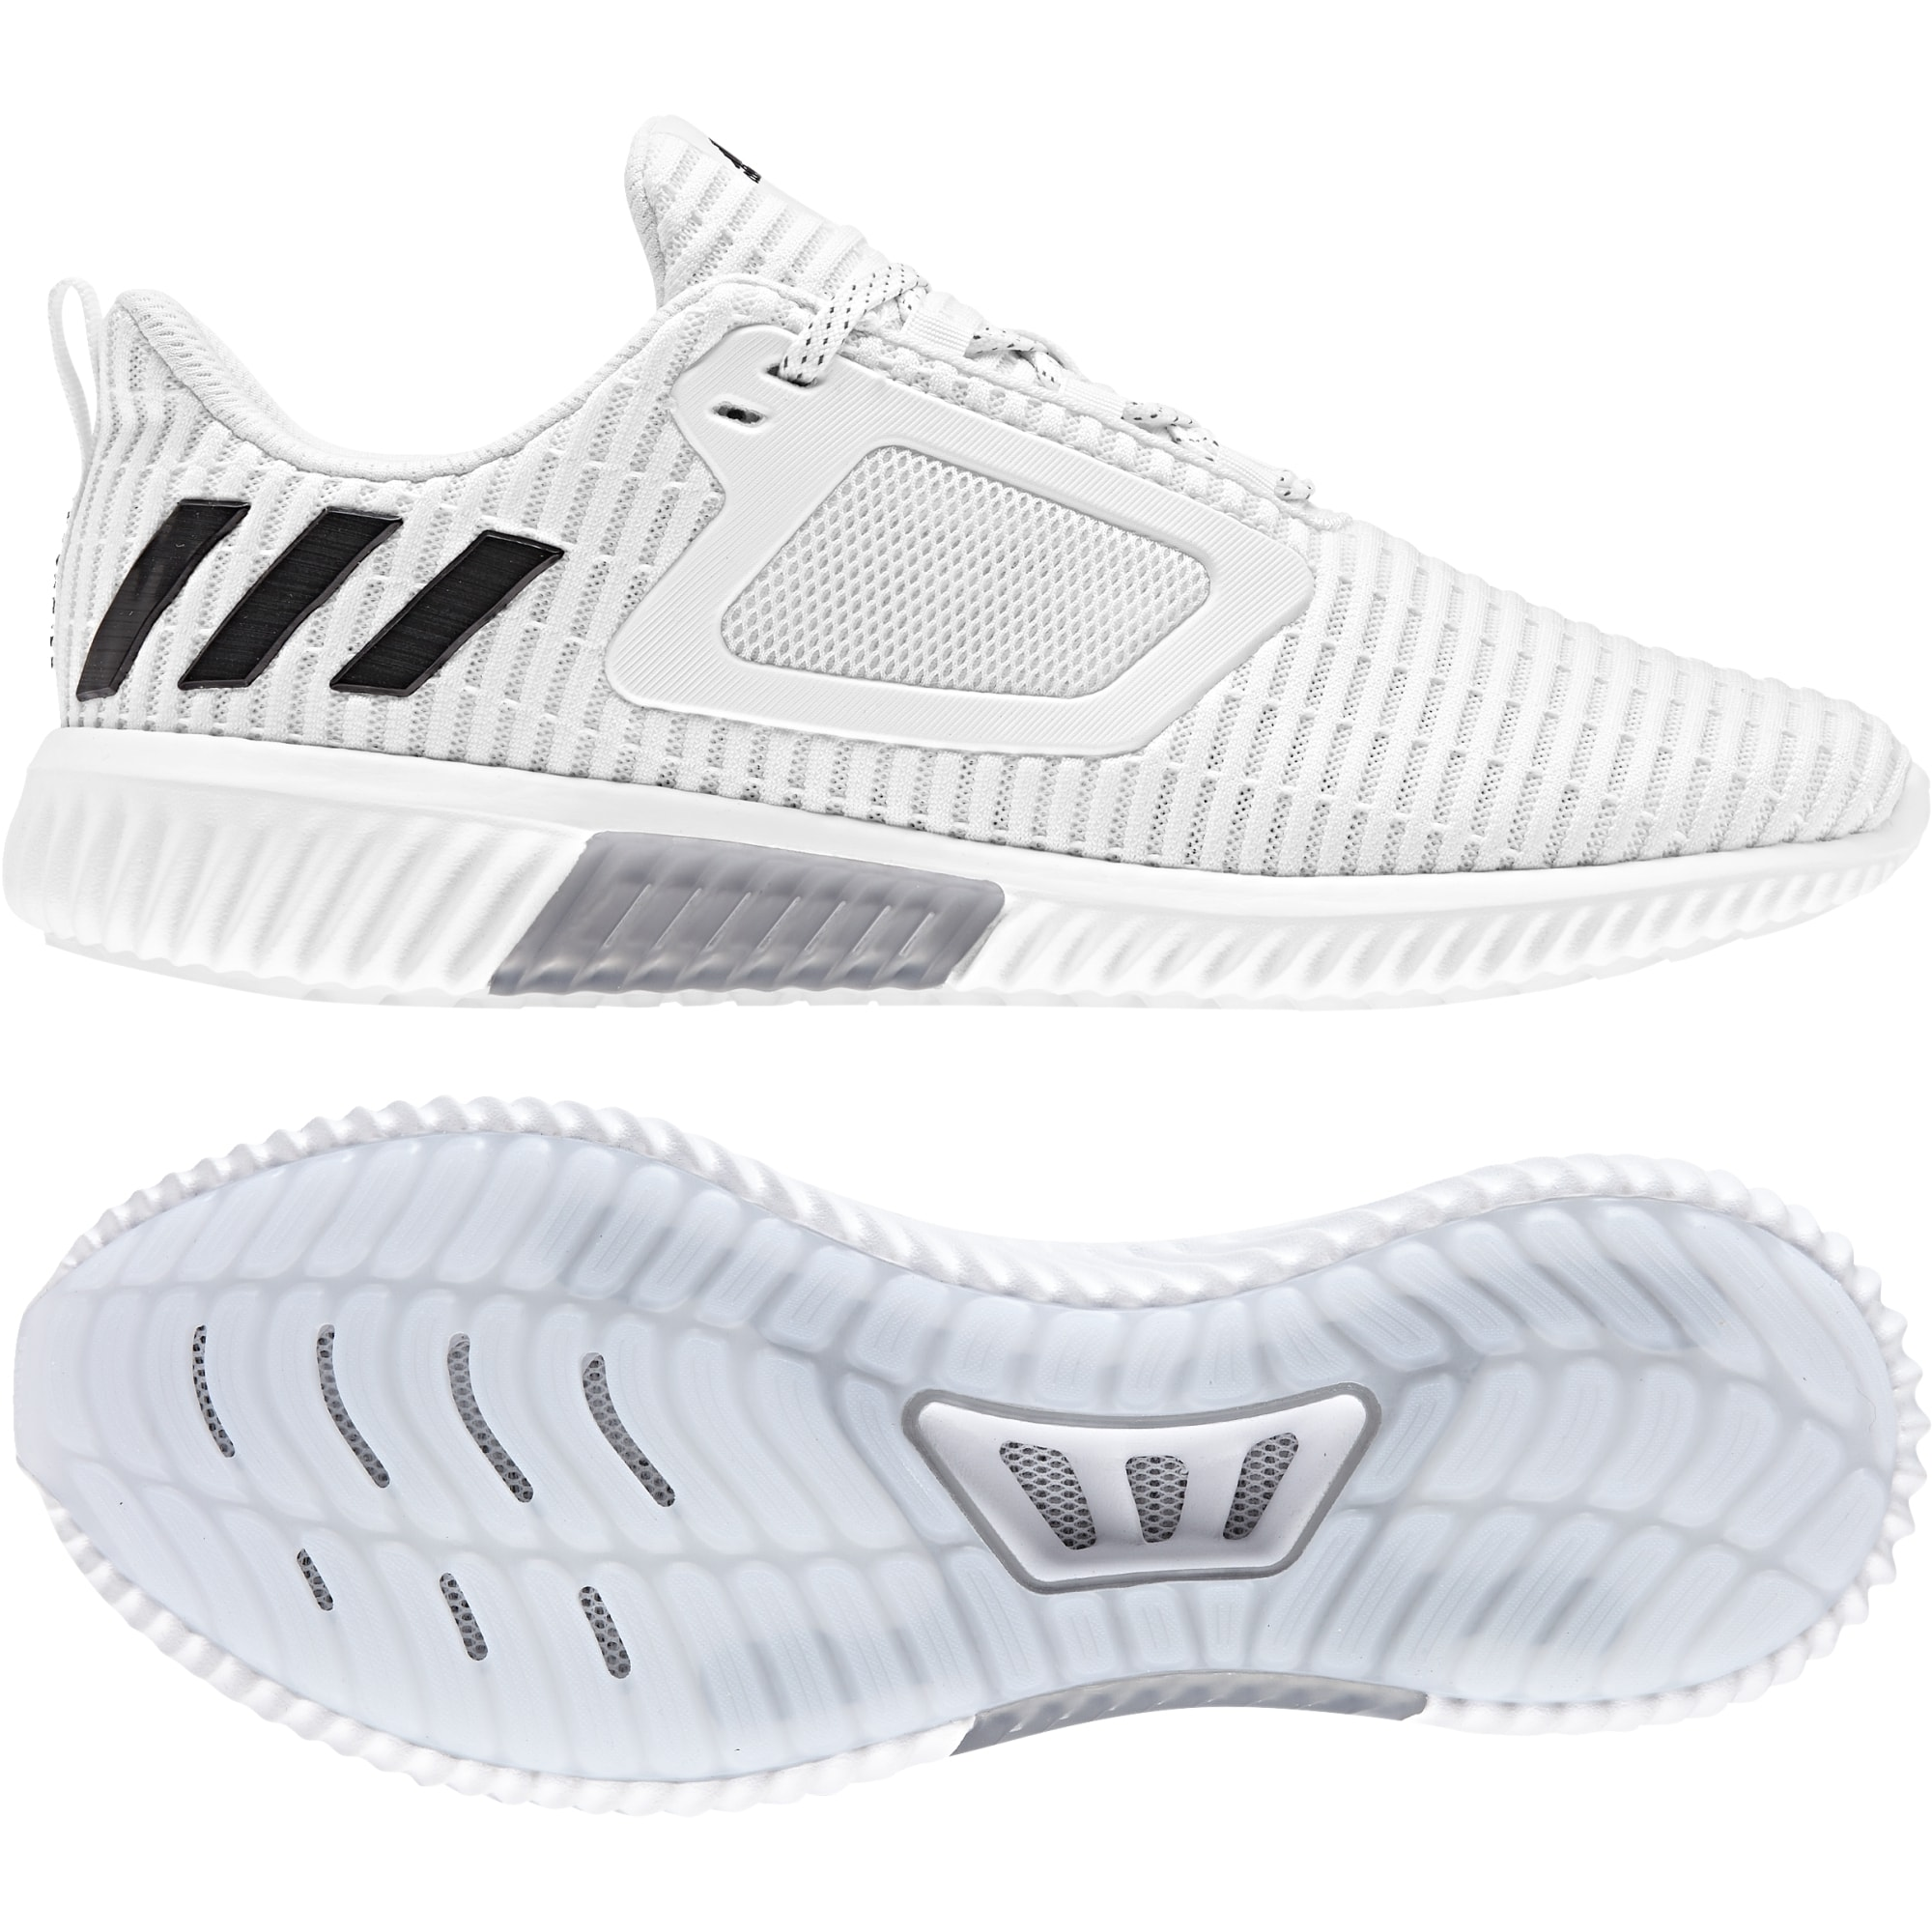 Adidas Climacool Joggesko Whiteblacksilver Tights.no